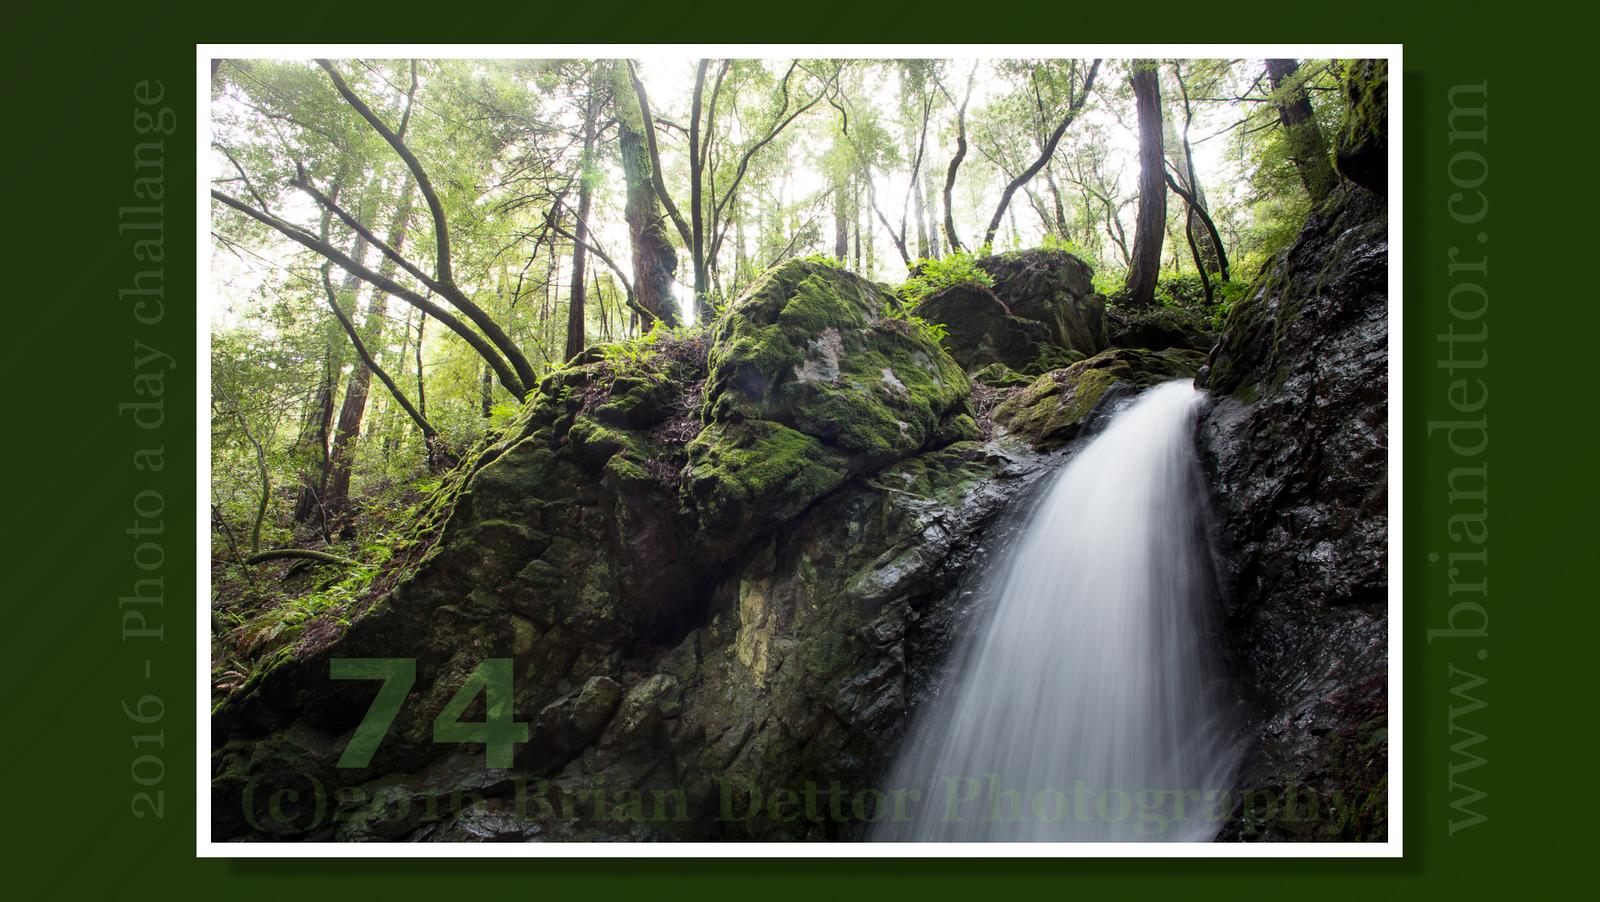 Day #74 - Cascade Falls #2